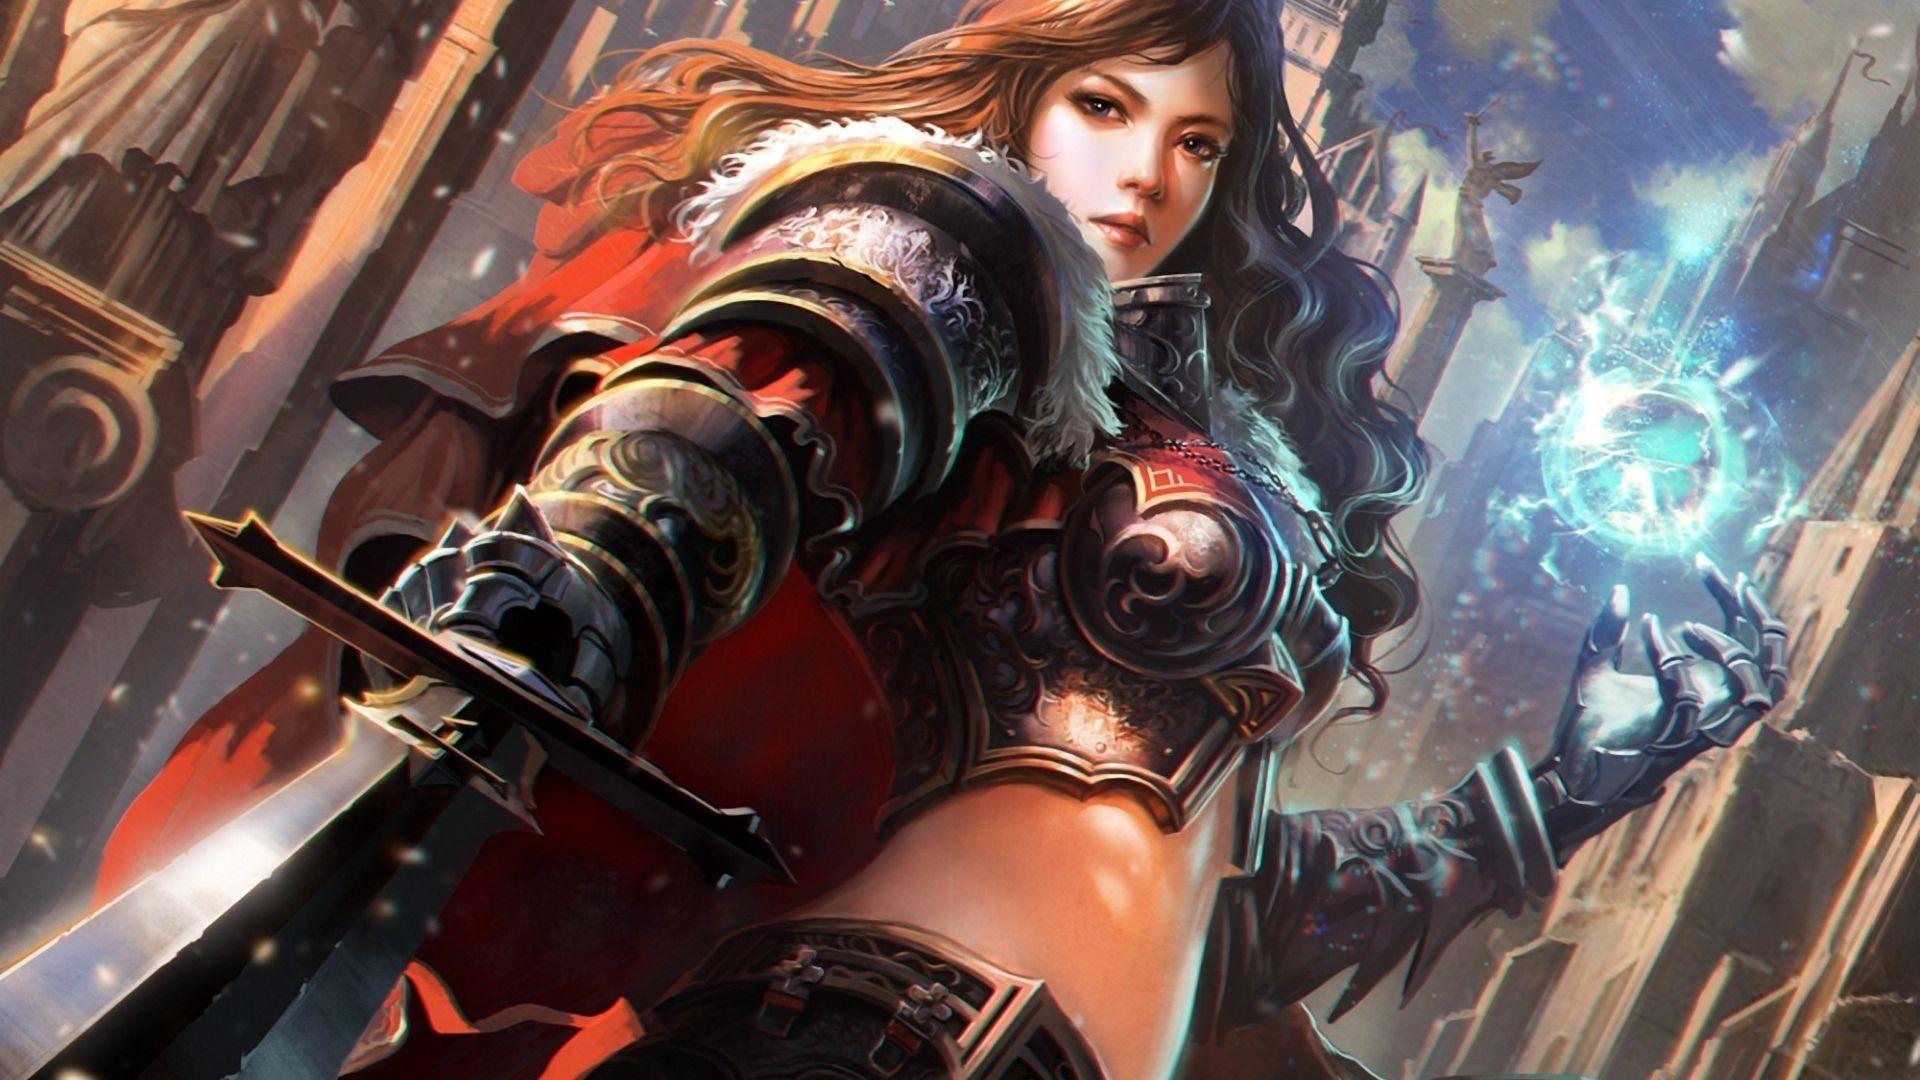 Fantasy Women Warrior Wallpaper | Fantasy | Pinterest | Woman ...